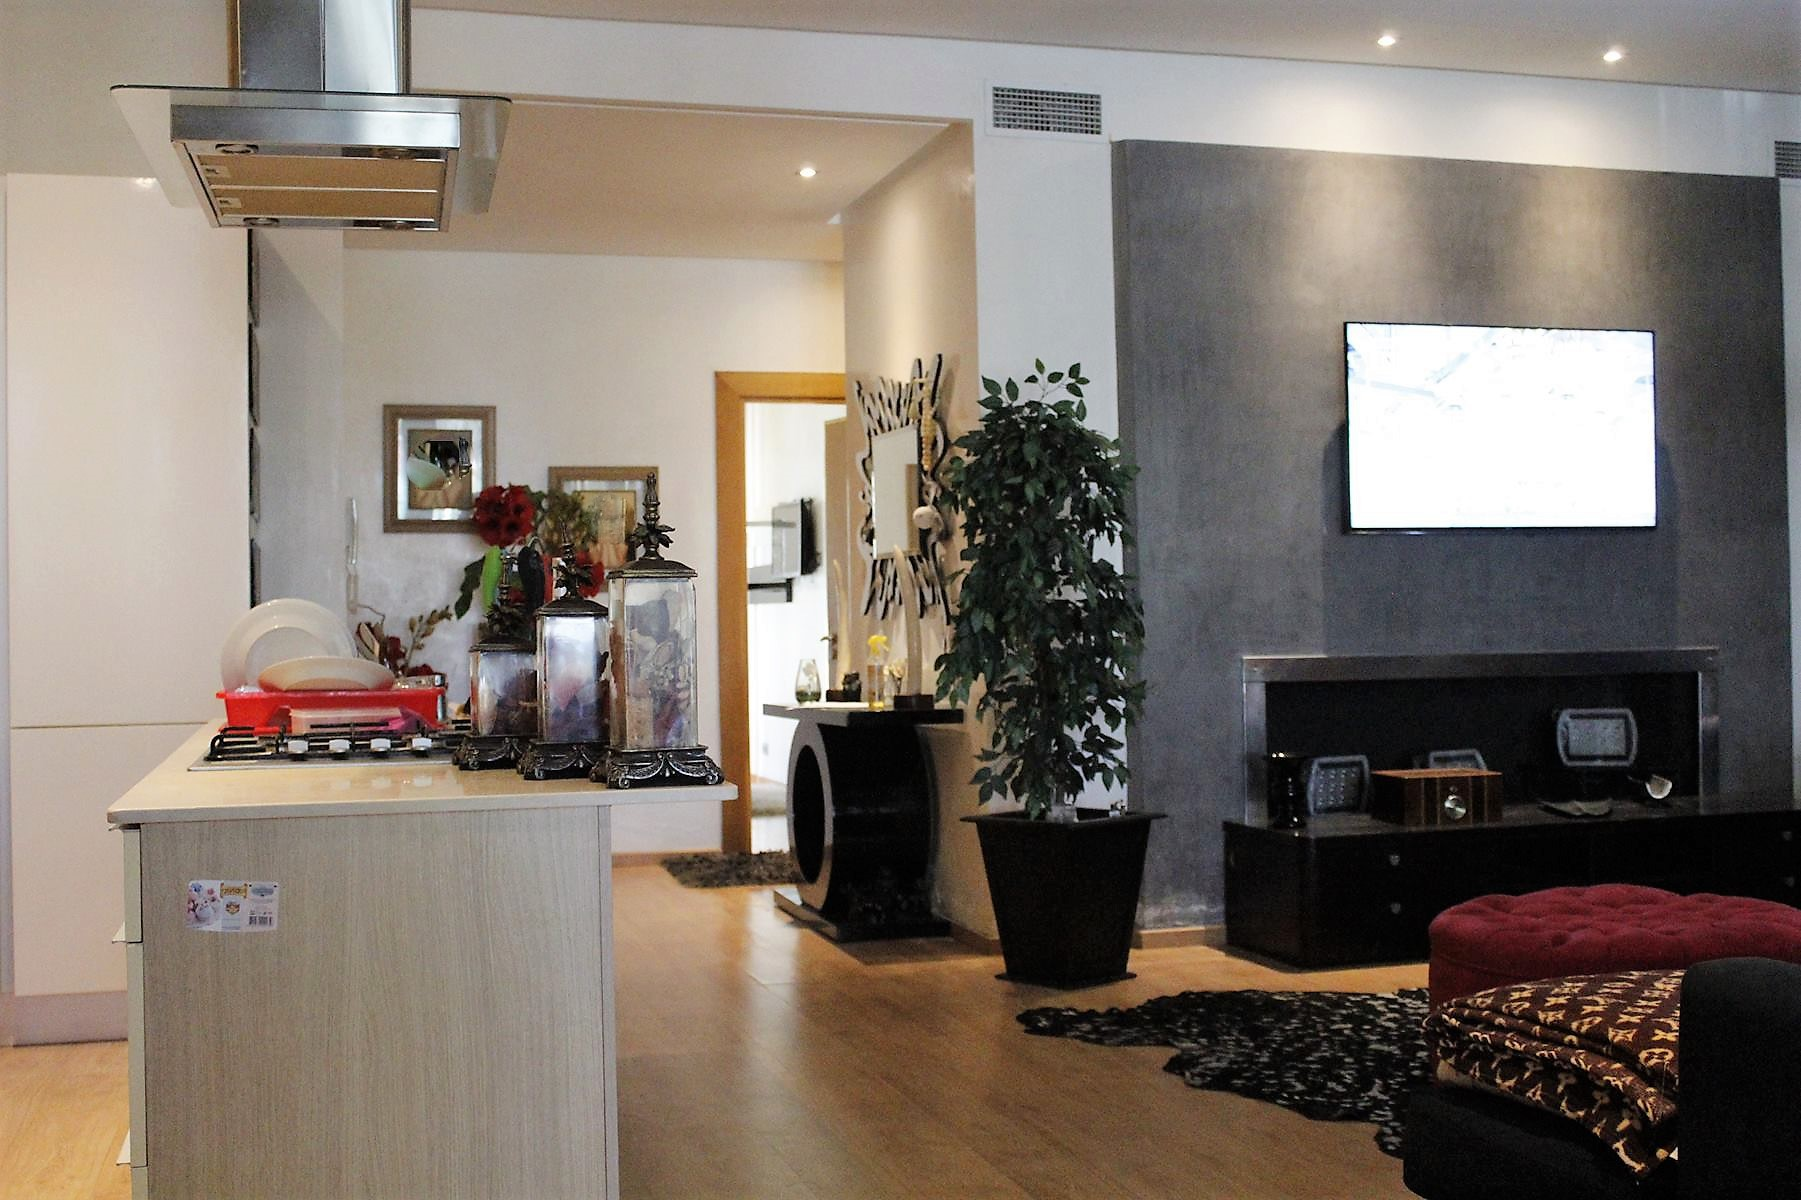 Maroc, Casablanca, Bld Massira al Khadra vend 290 m² logement en dernier étage avec très grande terrasse très ensoleillé